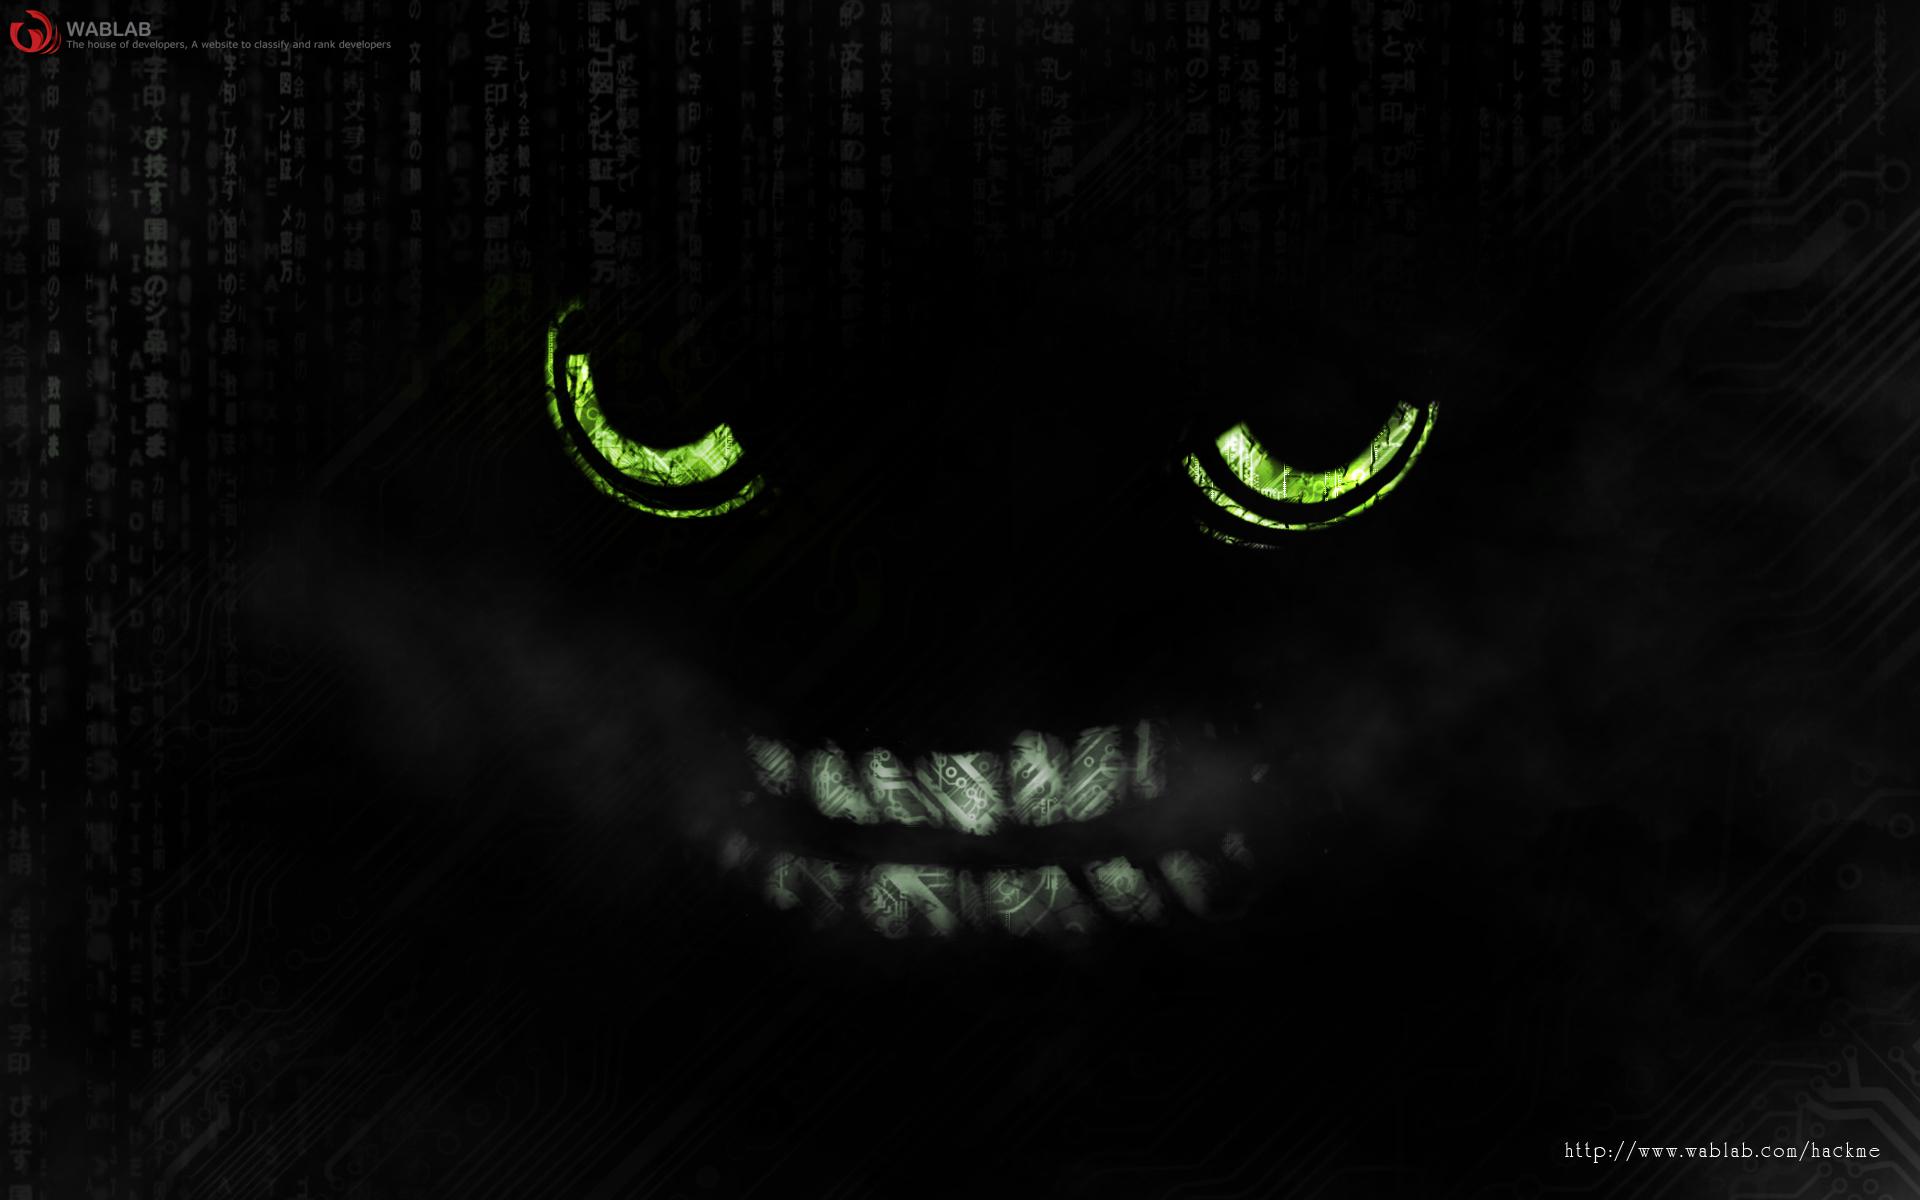 black hat hackers wallpaper - photo #6